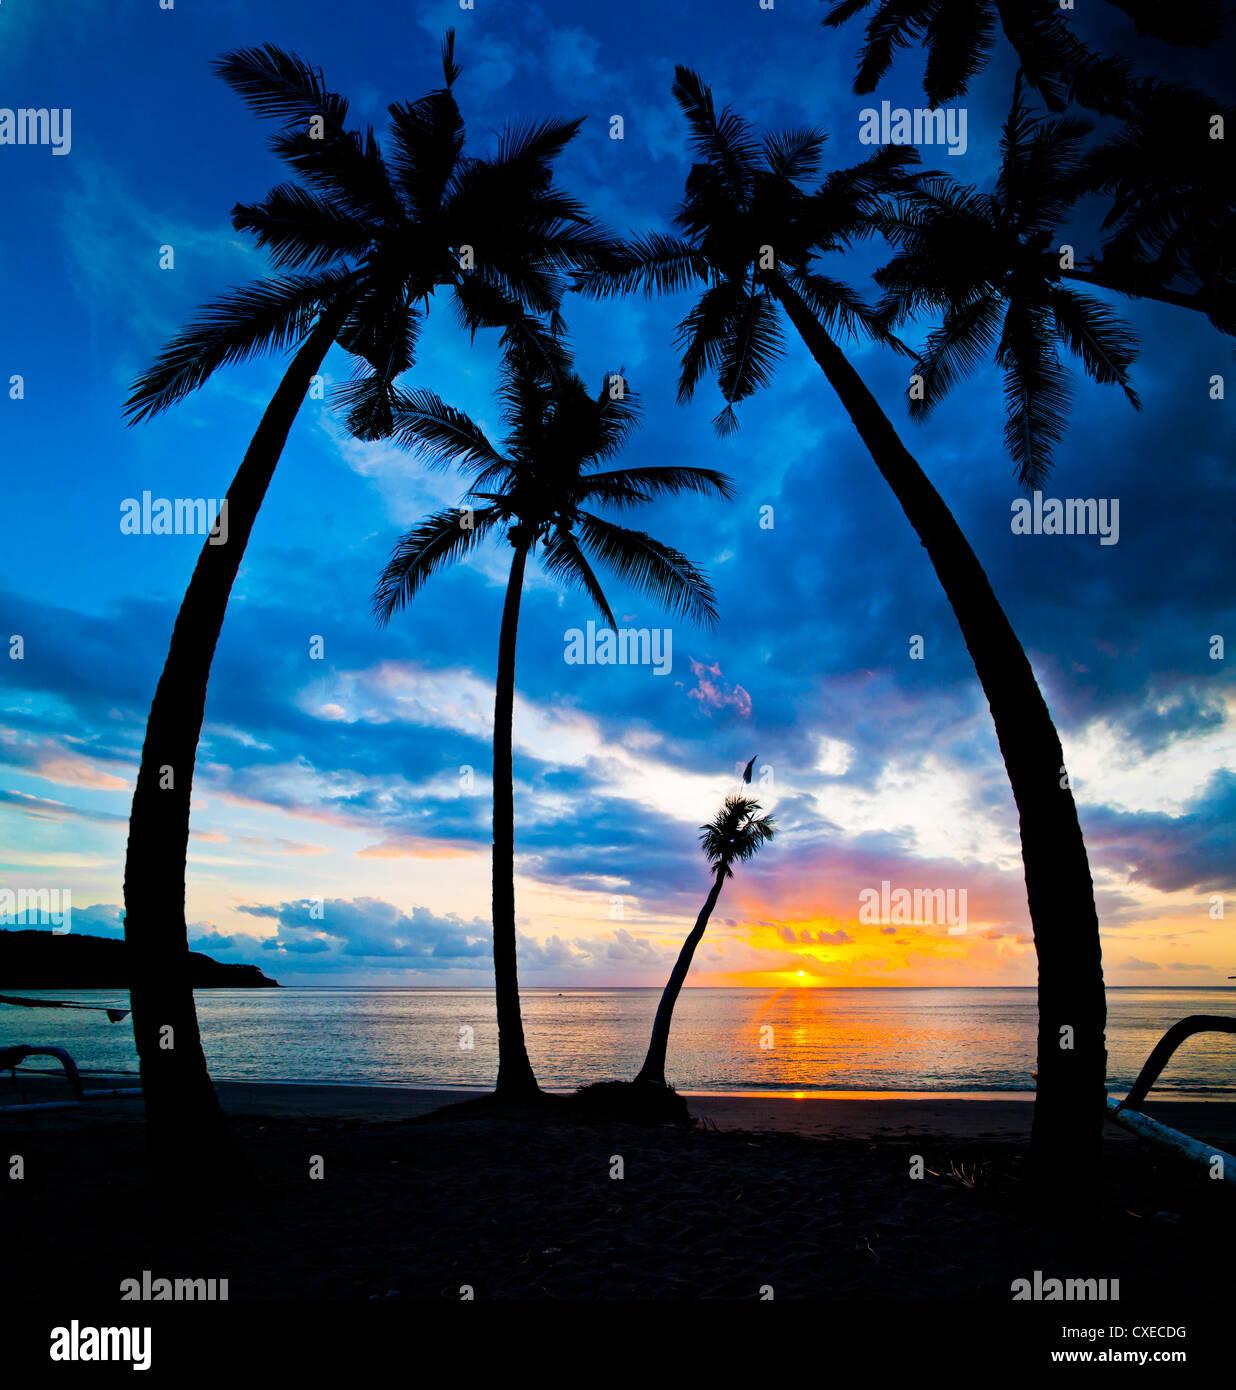 Silhouette di palme al tramonto, Nippah Beach, Lombok, Indonesia, Asia sud-orientale, Asia Immagini Stock